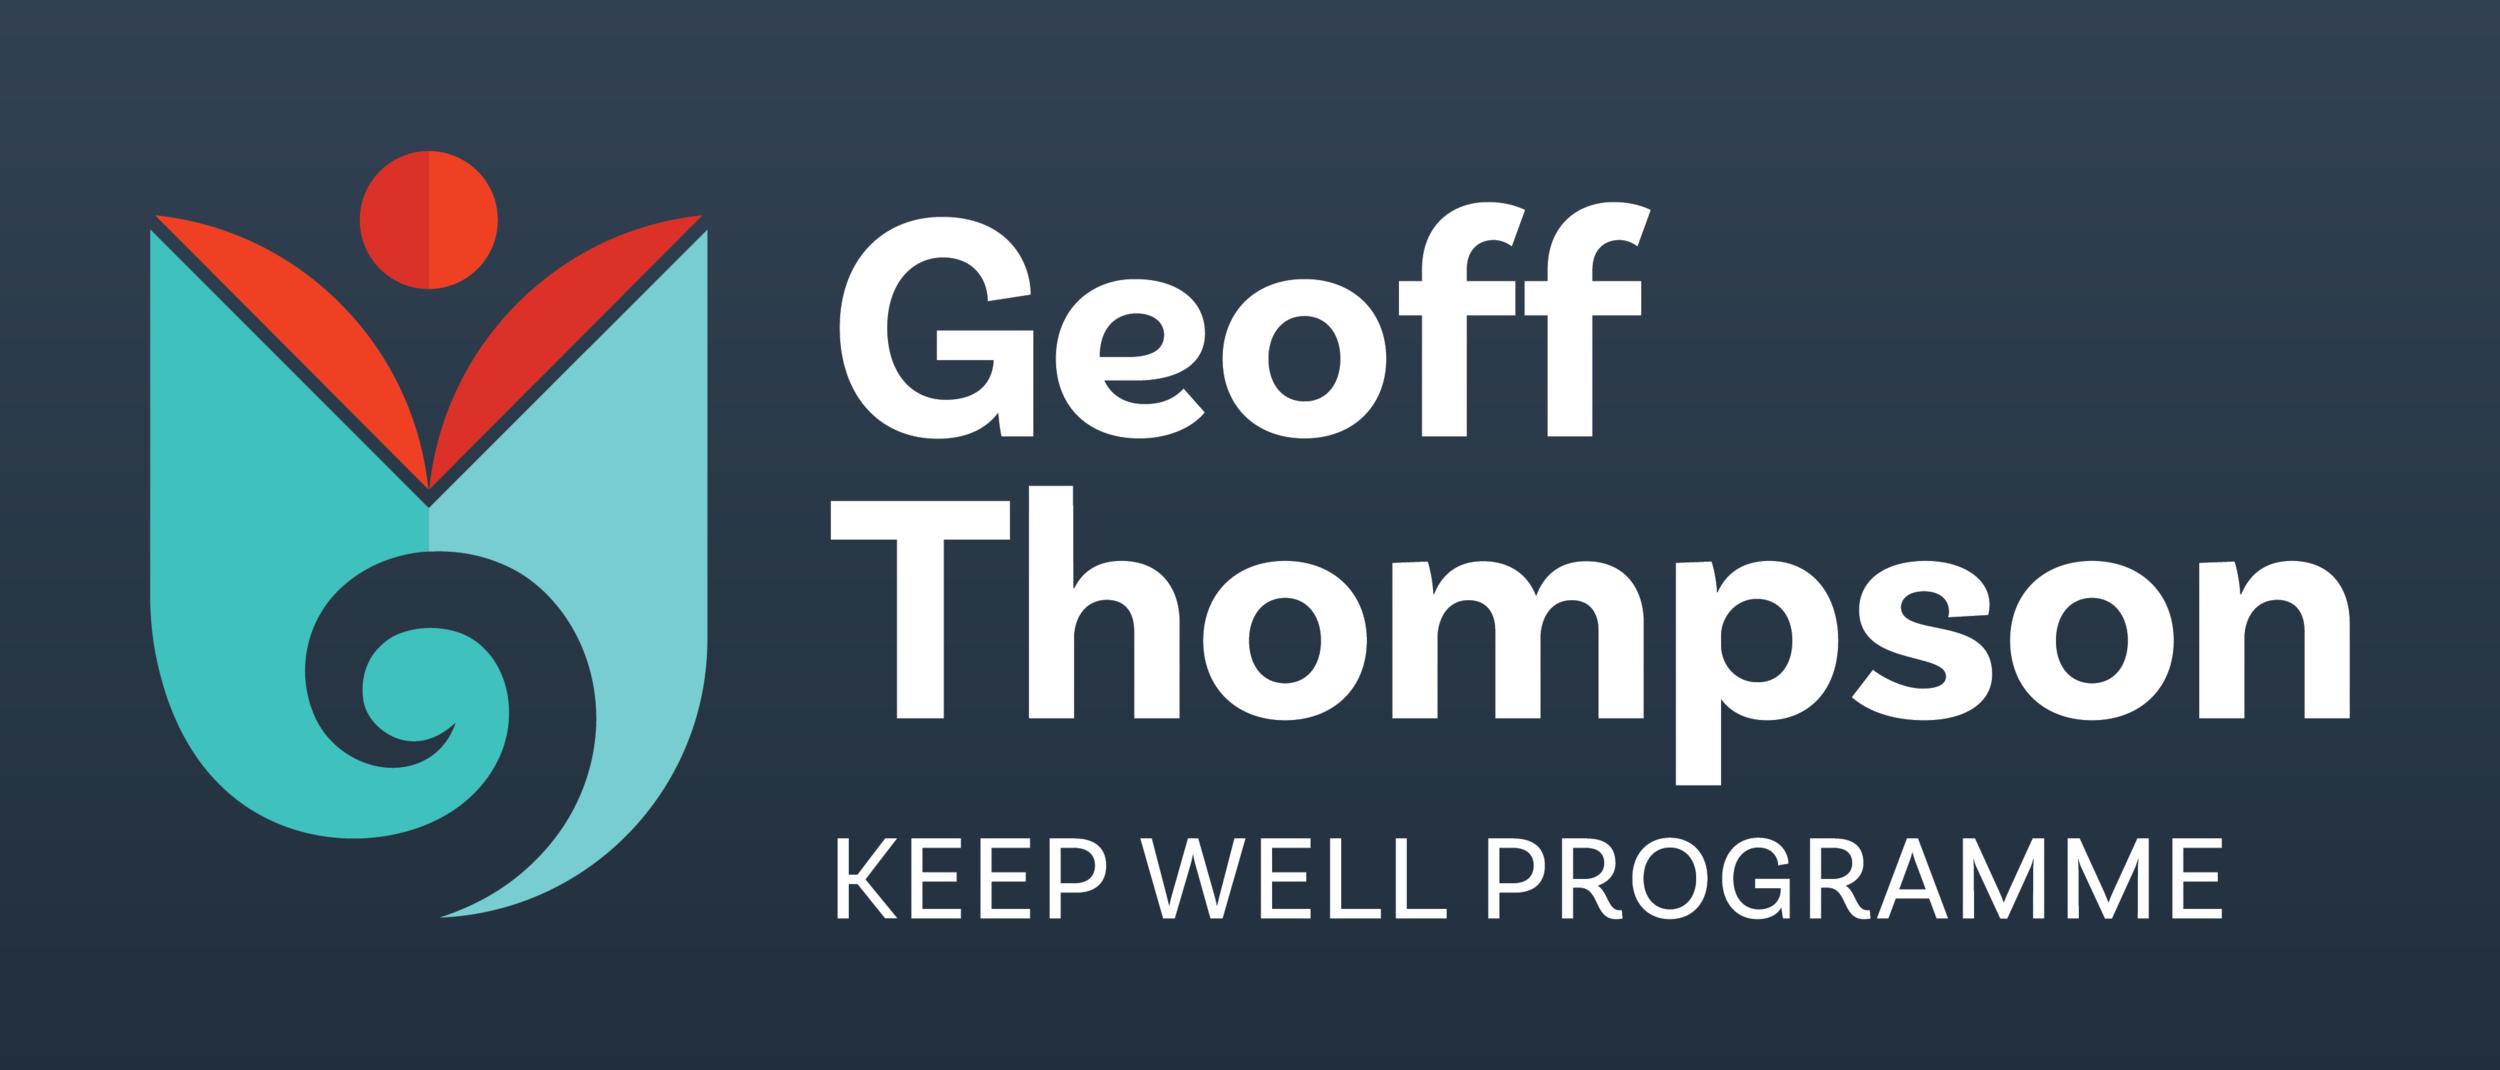 Geoff Thompson programme logo final-01.png